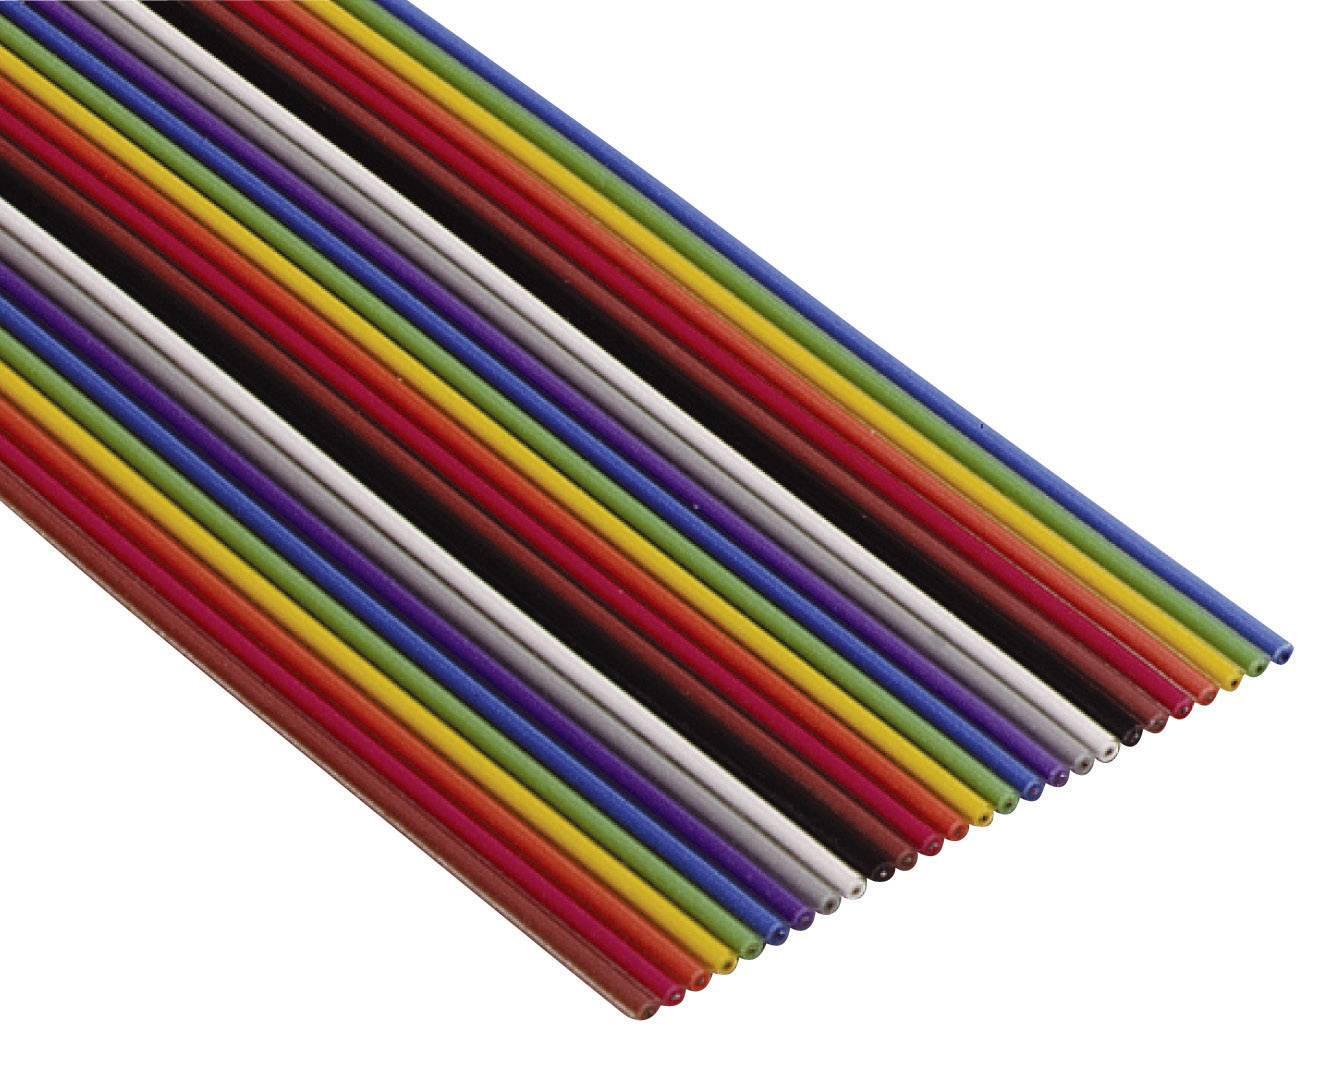 Plochý kabel 3M 3M-3302-10 SF (80610790075), nestíněný, 1 m